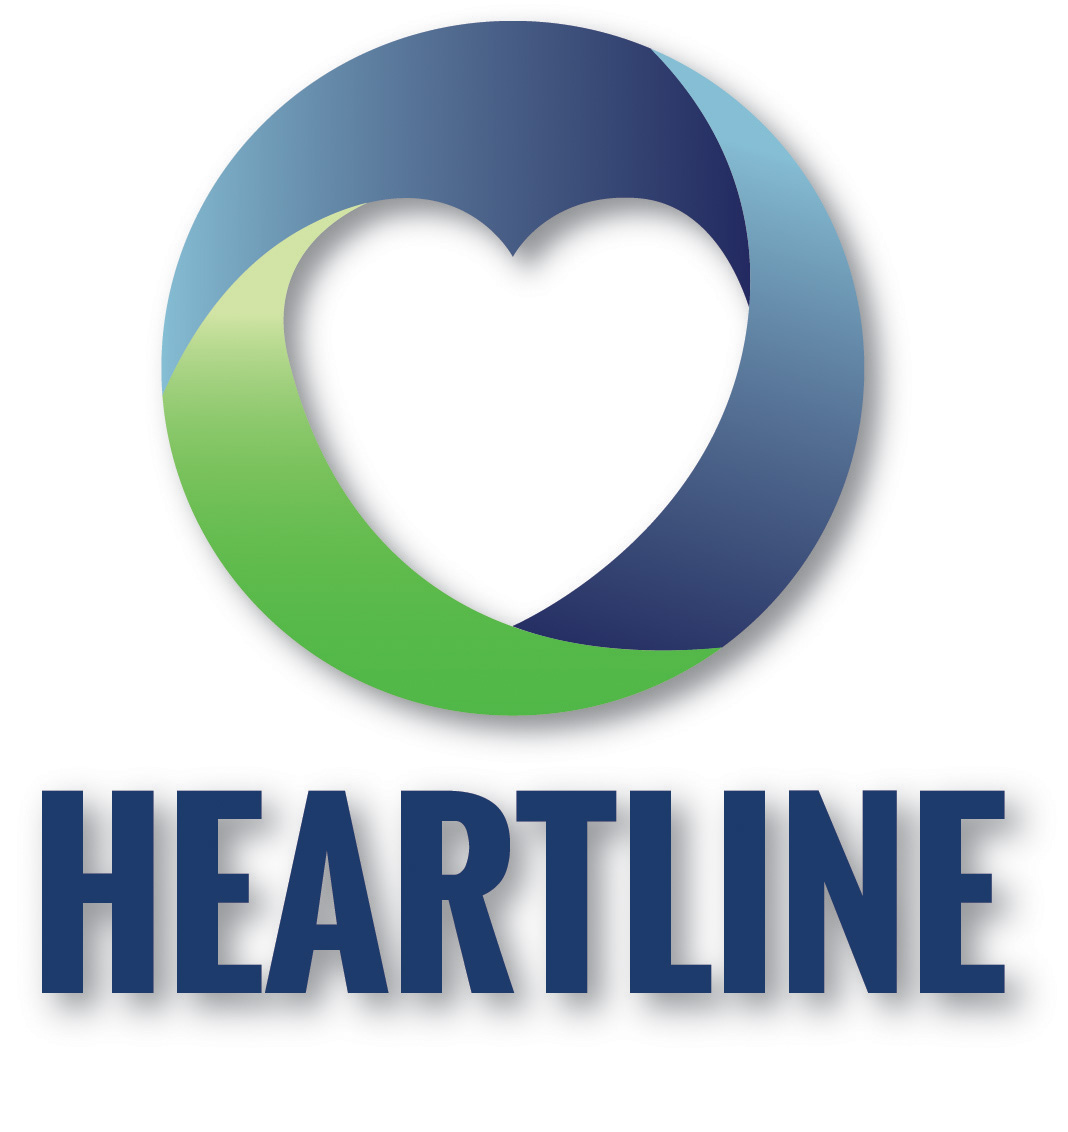 Heartline Introduces New Fatherhood Mentoring Program